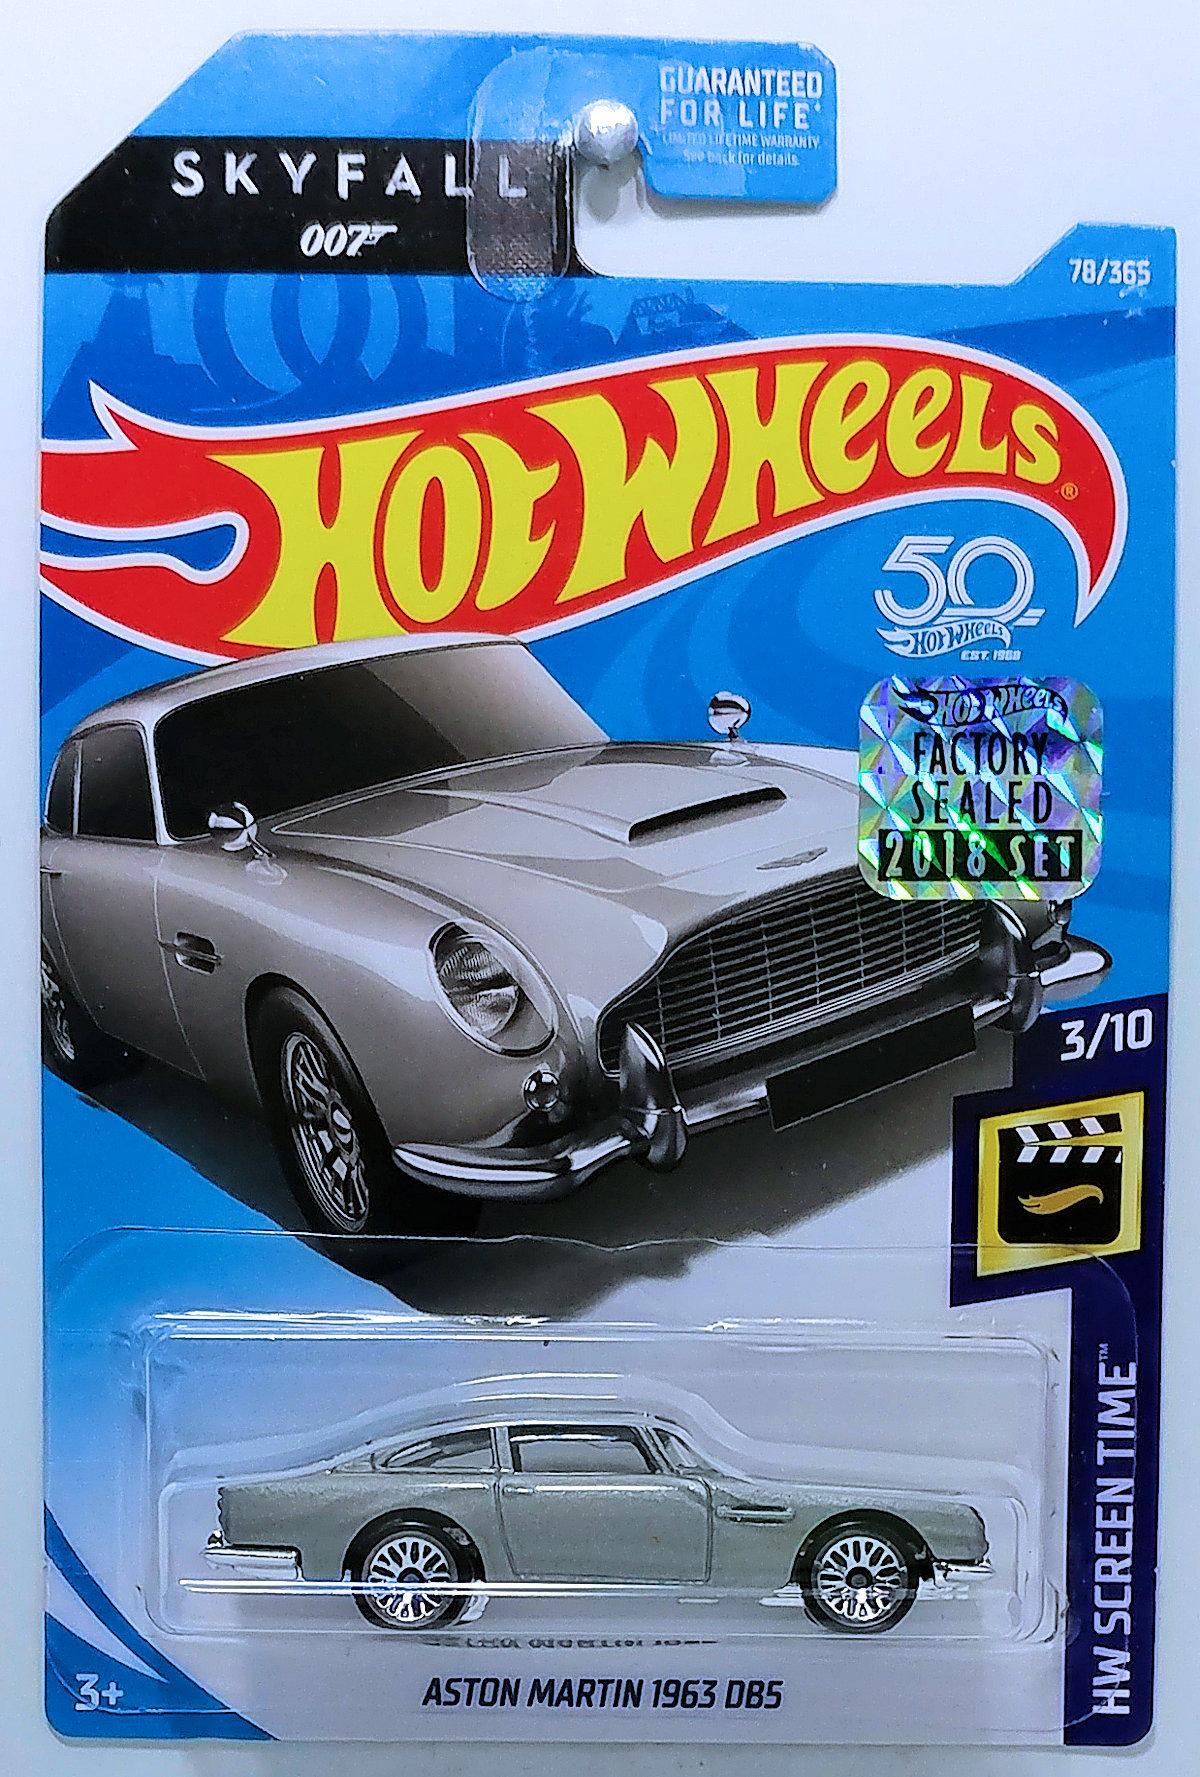 Hot Wheels Aston Martin 1963 DB5 Skyfall 007 HW Screen Time